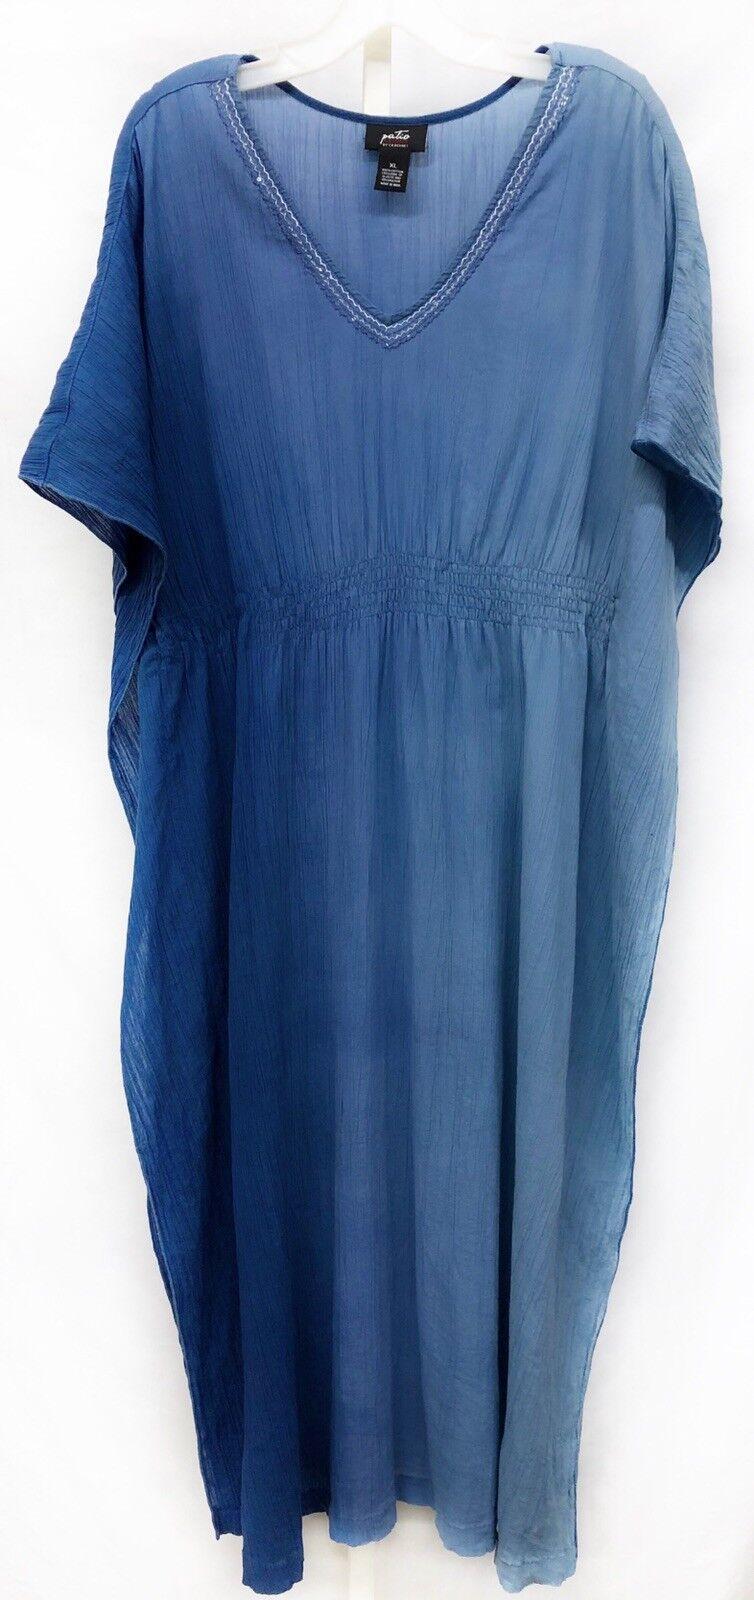 Patio Casuals Sz XL Cabernet bluee Hombre Tie Dye Maxi Caftan Muu House Dress